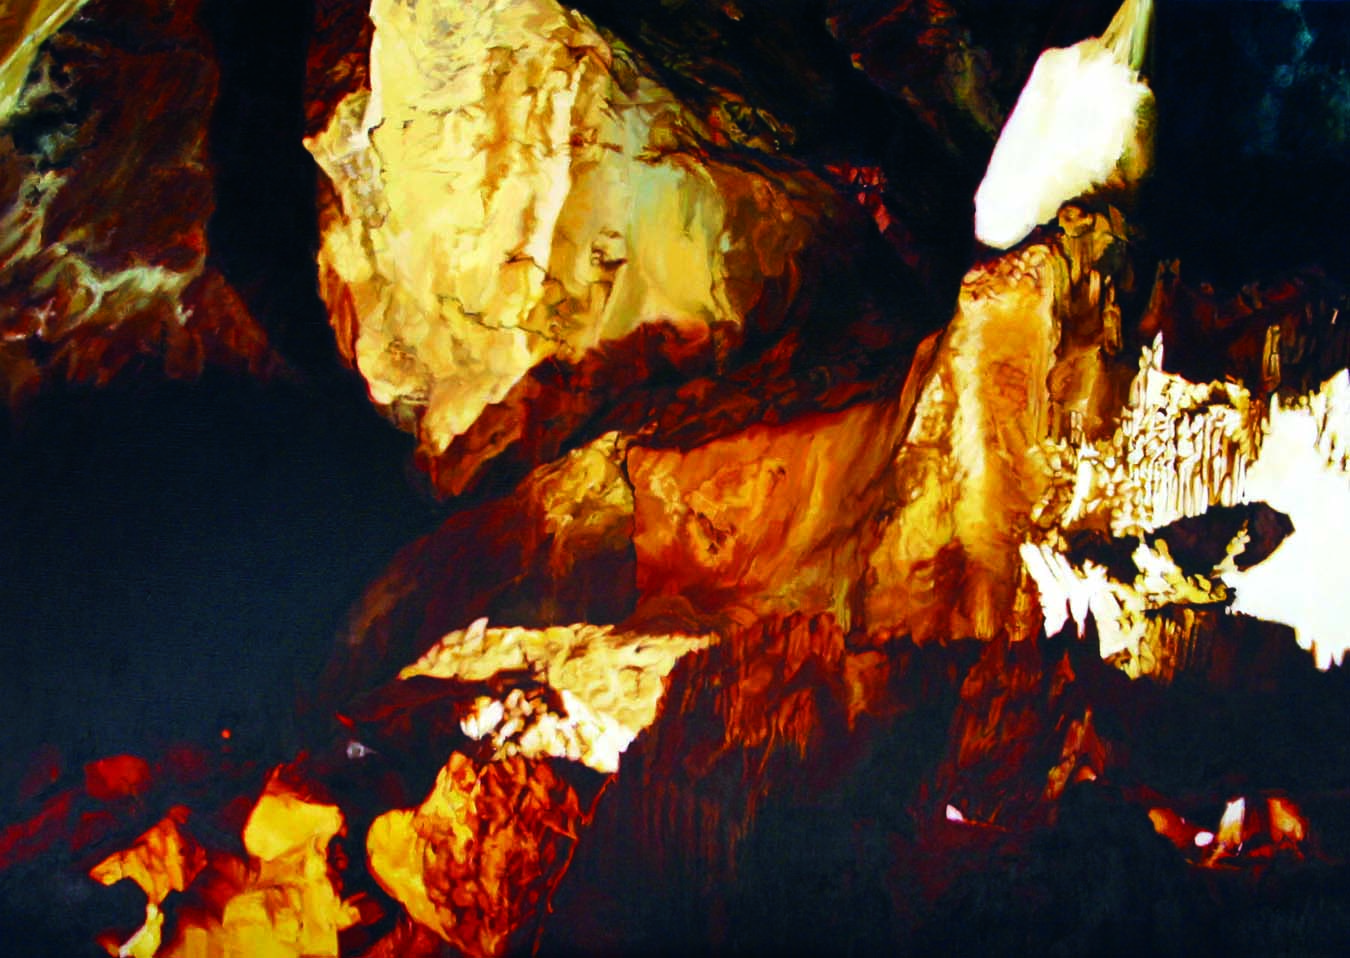 Cavern Series, BoulderKnot